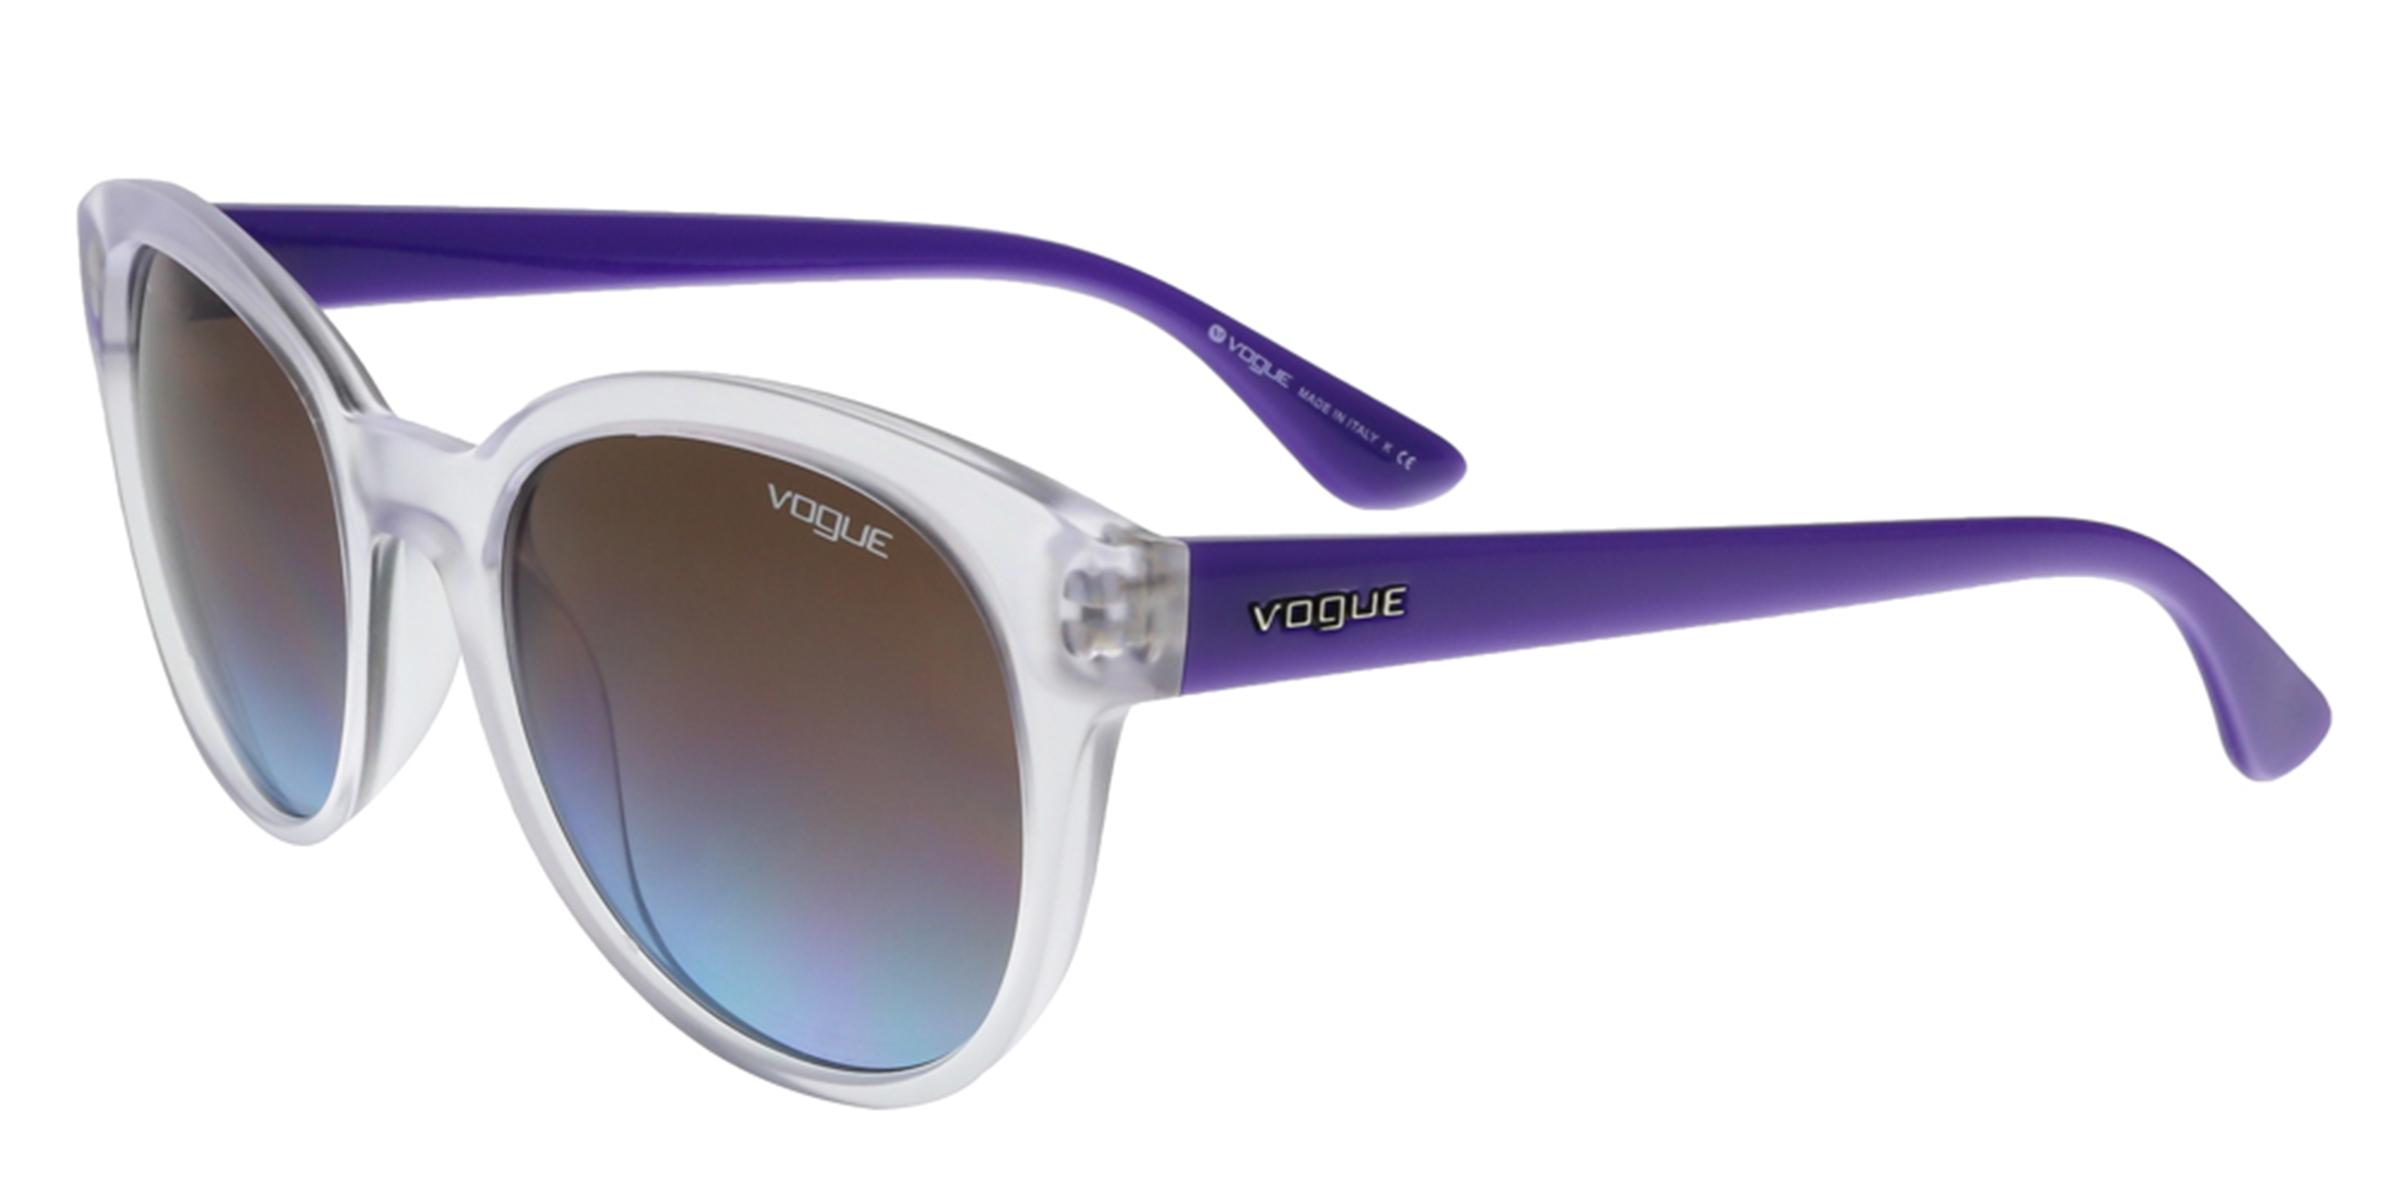 Vogue VO2795/S W74548 Clear/Purple Round sunglasses Sunglasses